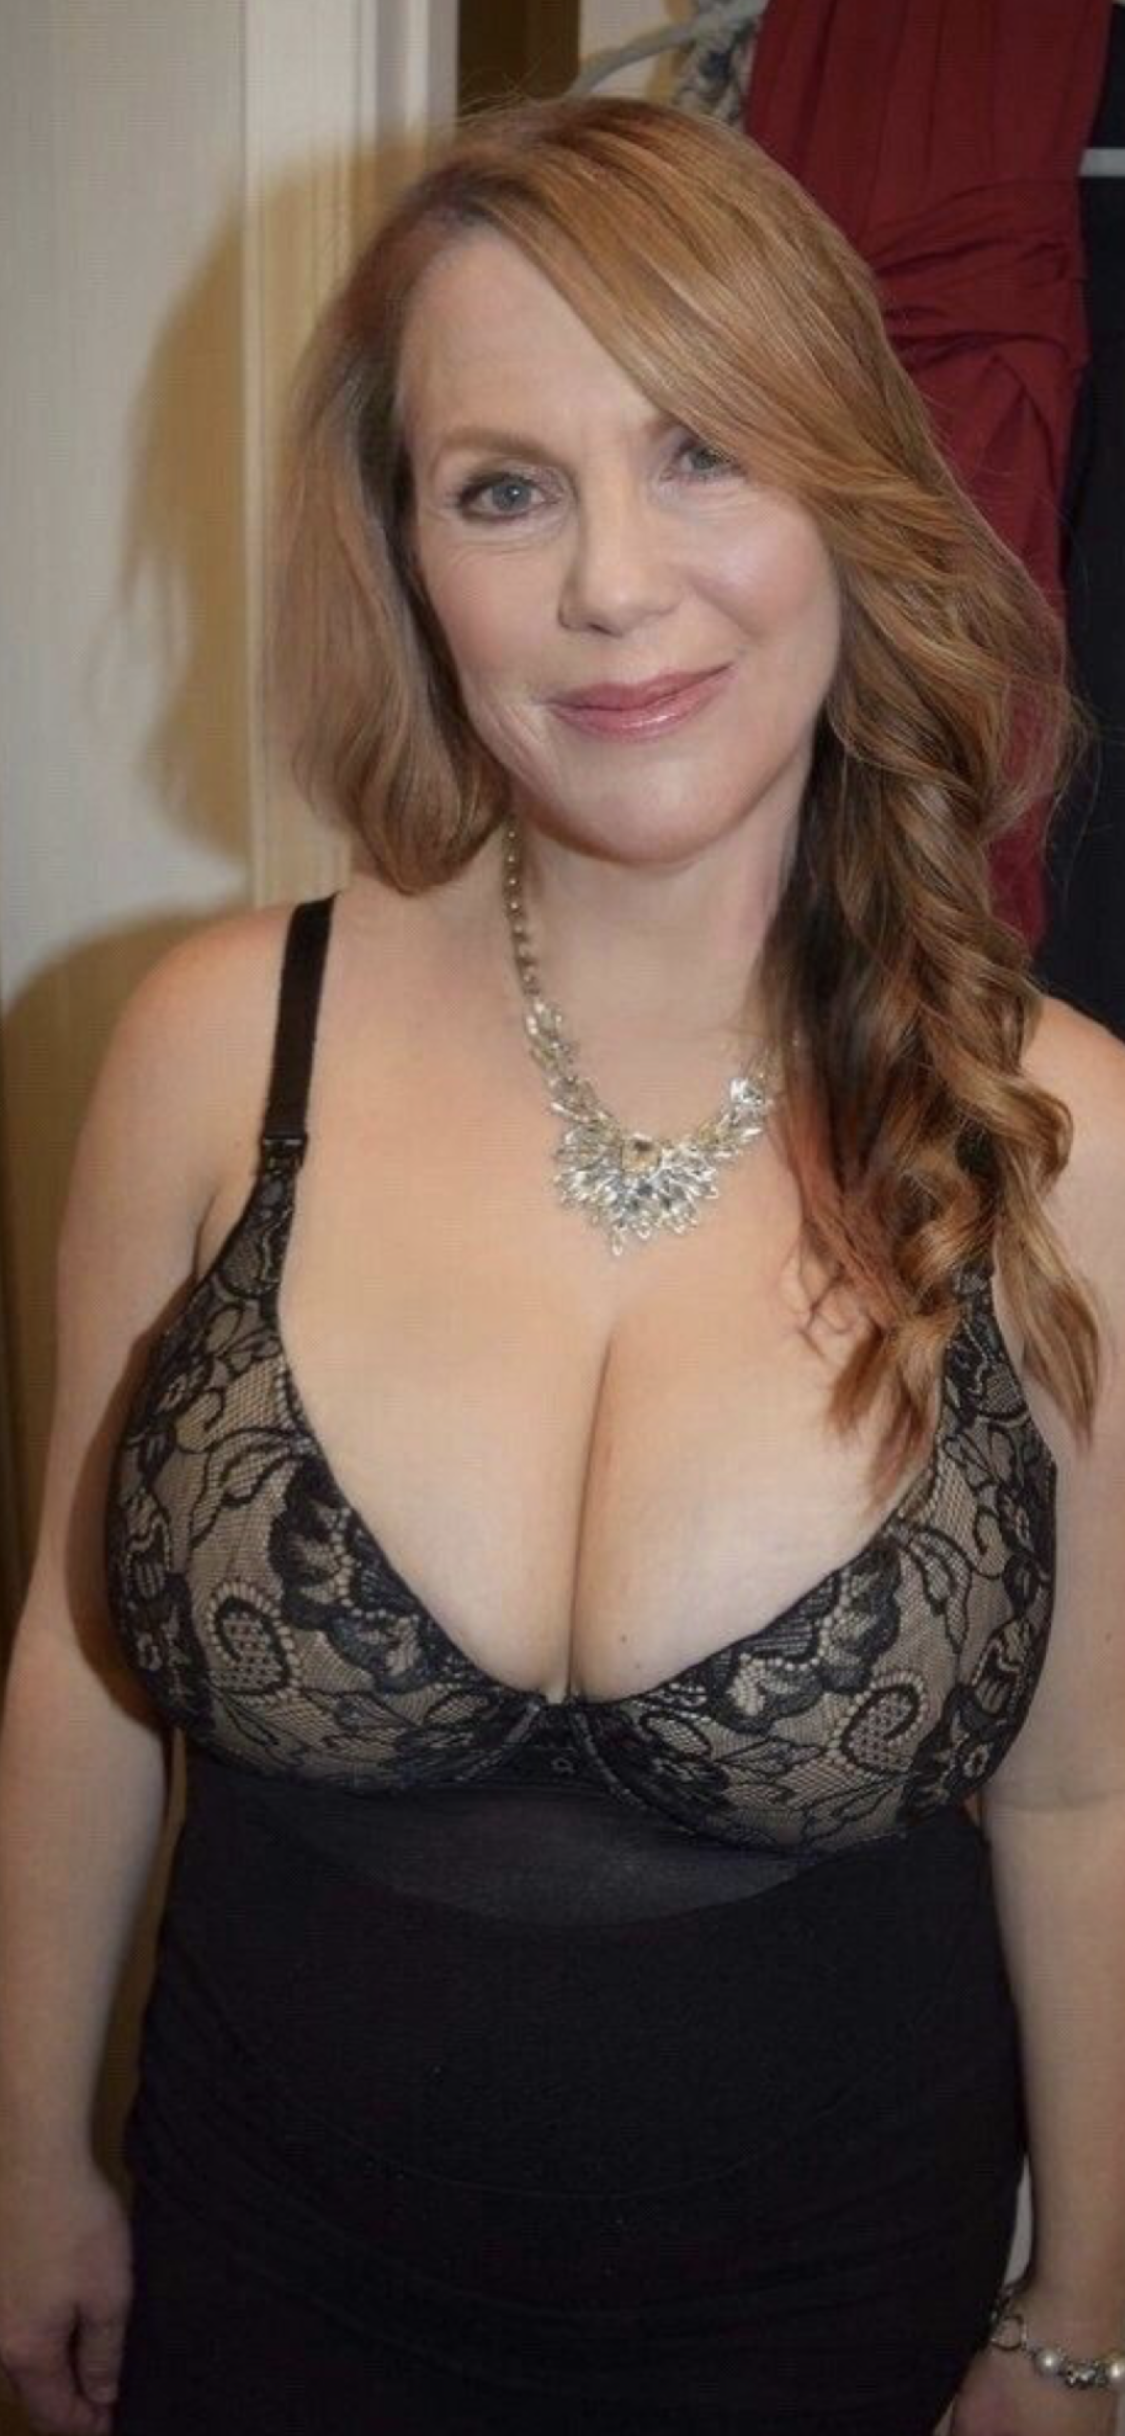 mature Women 40s nude